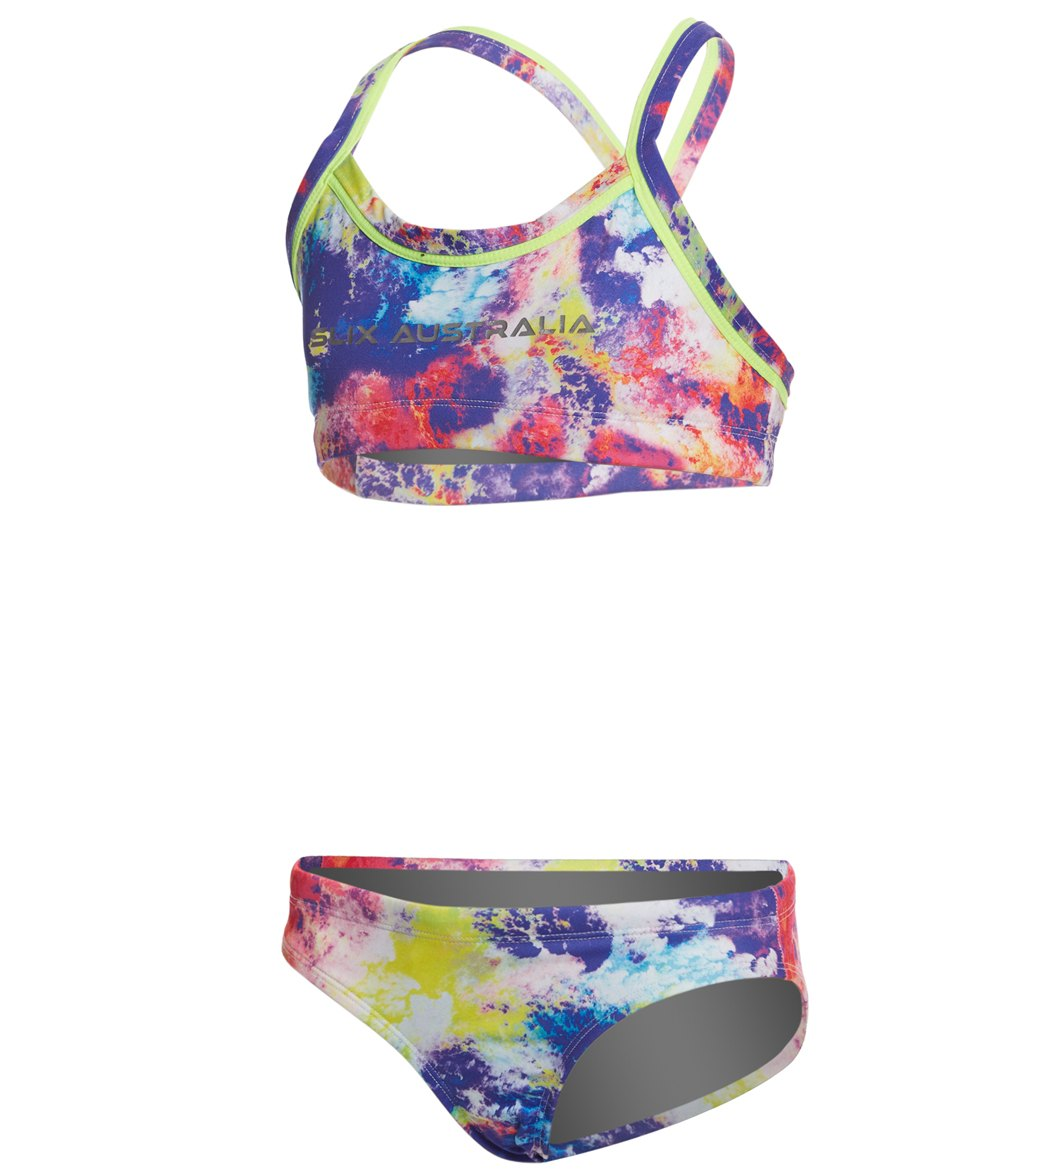 b9646496a19 Slix Australia Girls' Colour Run Two Piece Bikini Set at SwimOutlet.com -  Free Shipping